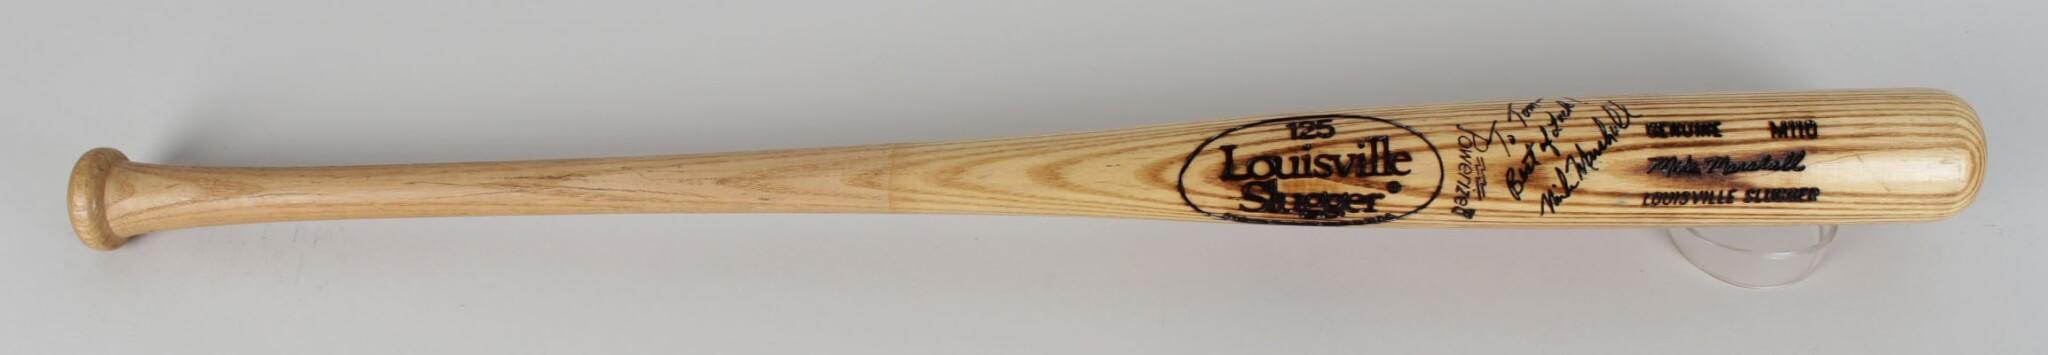 California Angels Mike Marshall Game-Used, Signed Louisville Slugger M110 Bat35975_01